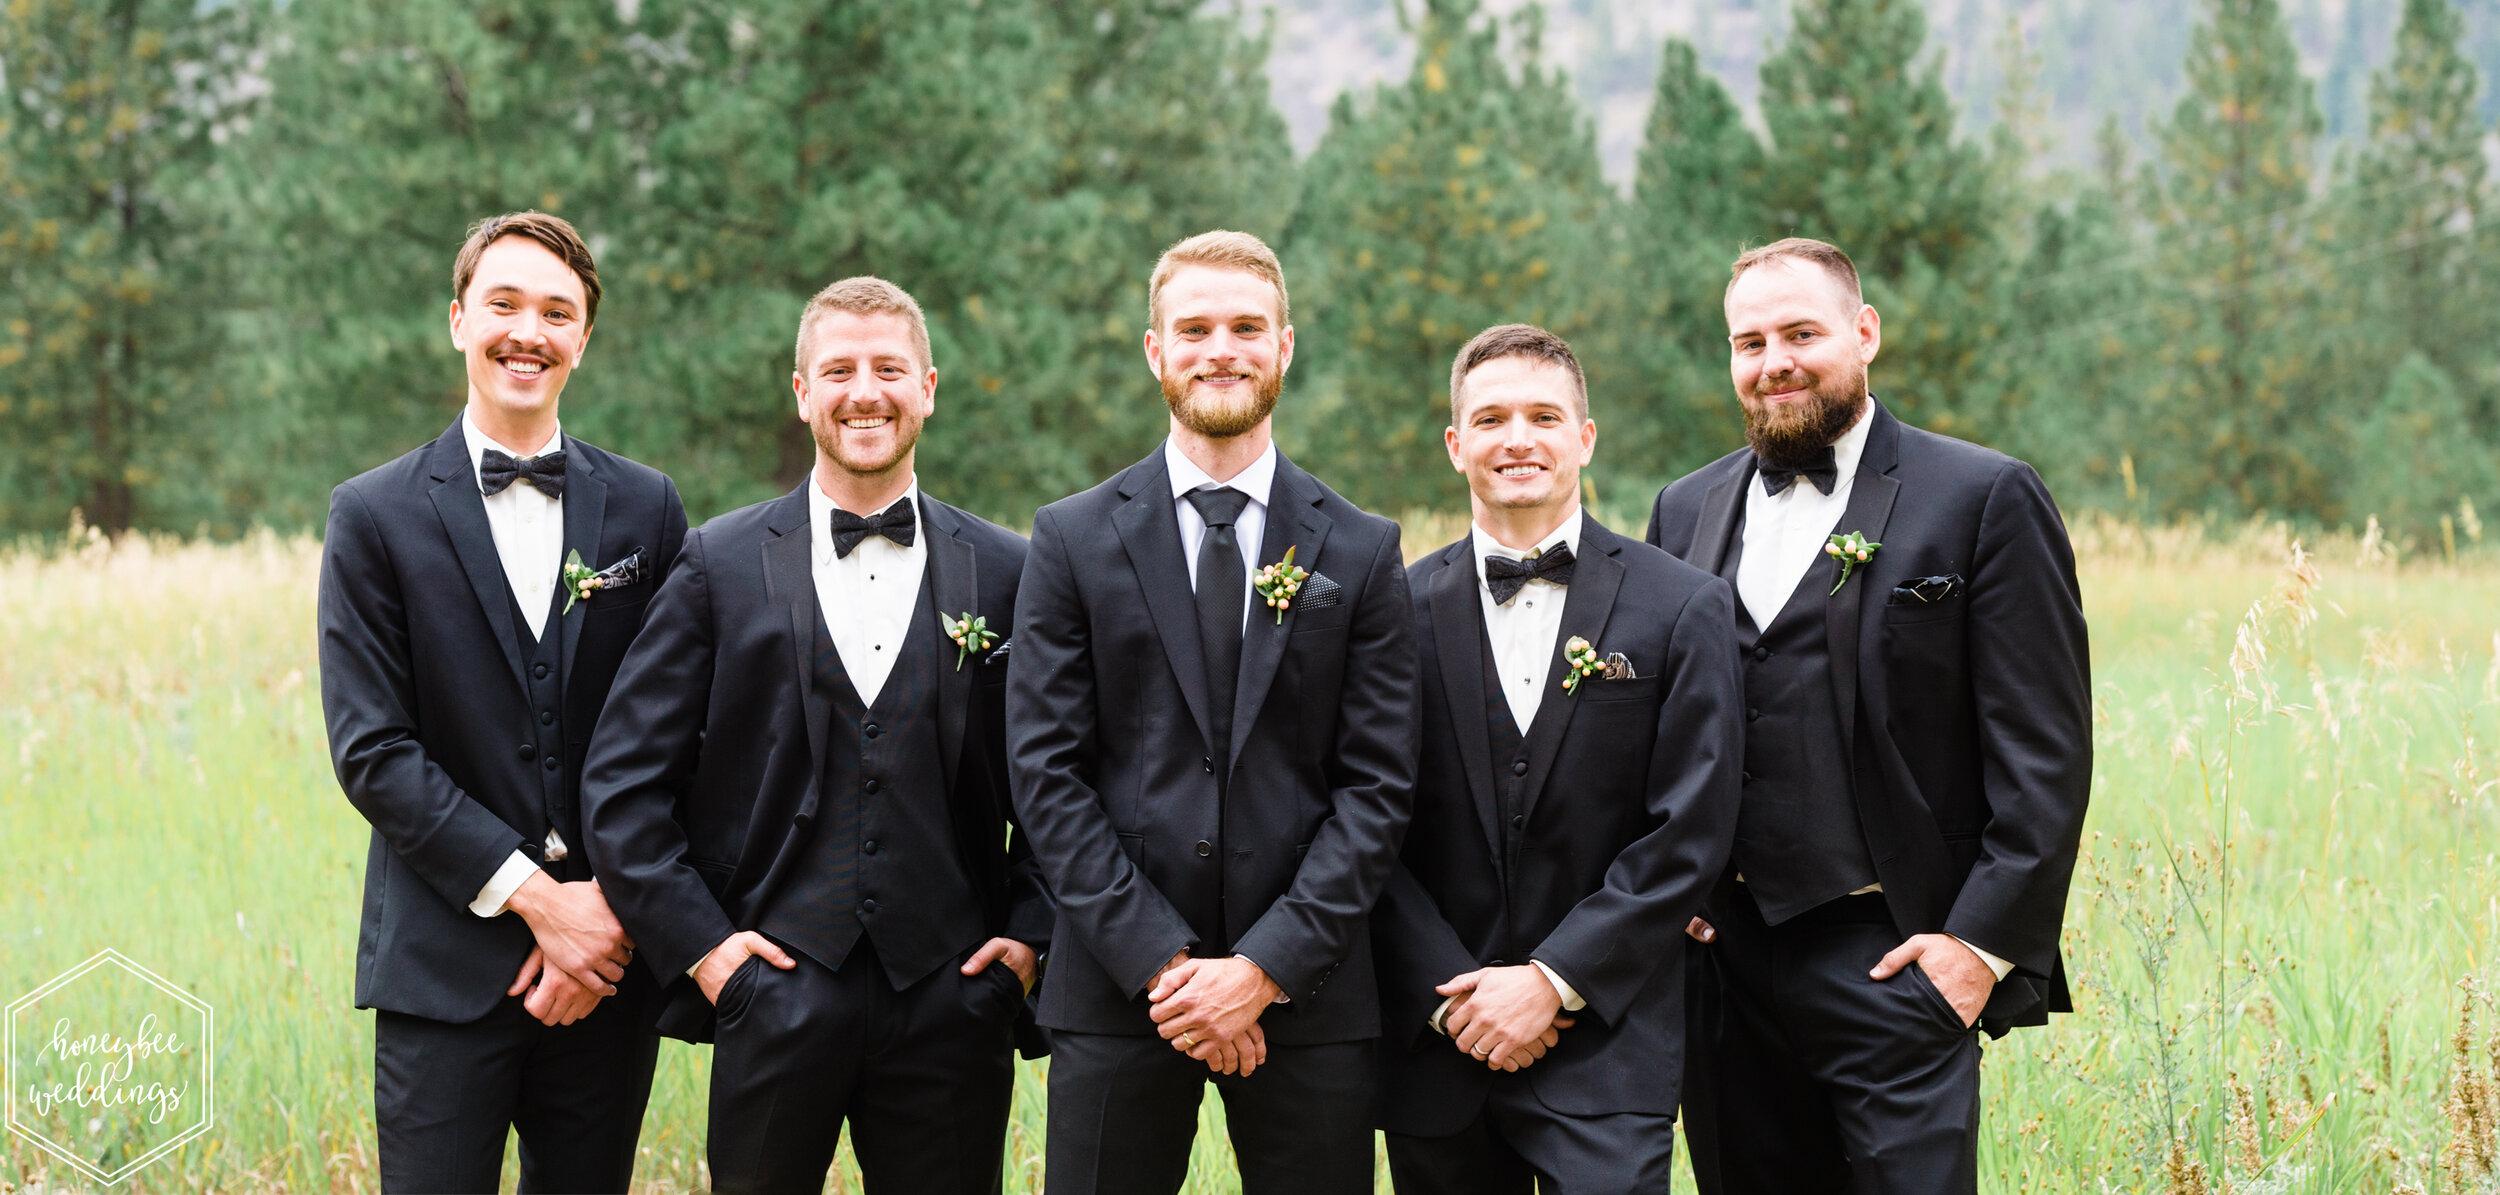 083White Raven Wedding_Montana Wedding Photographer_Corey & Corey_Honeybee Weddings_September 06, 2019-655-Pano.jpg